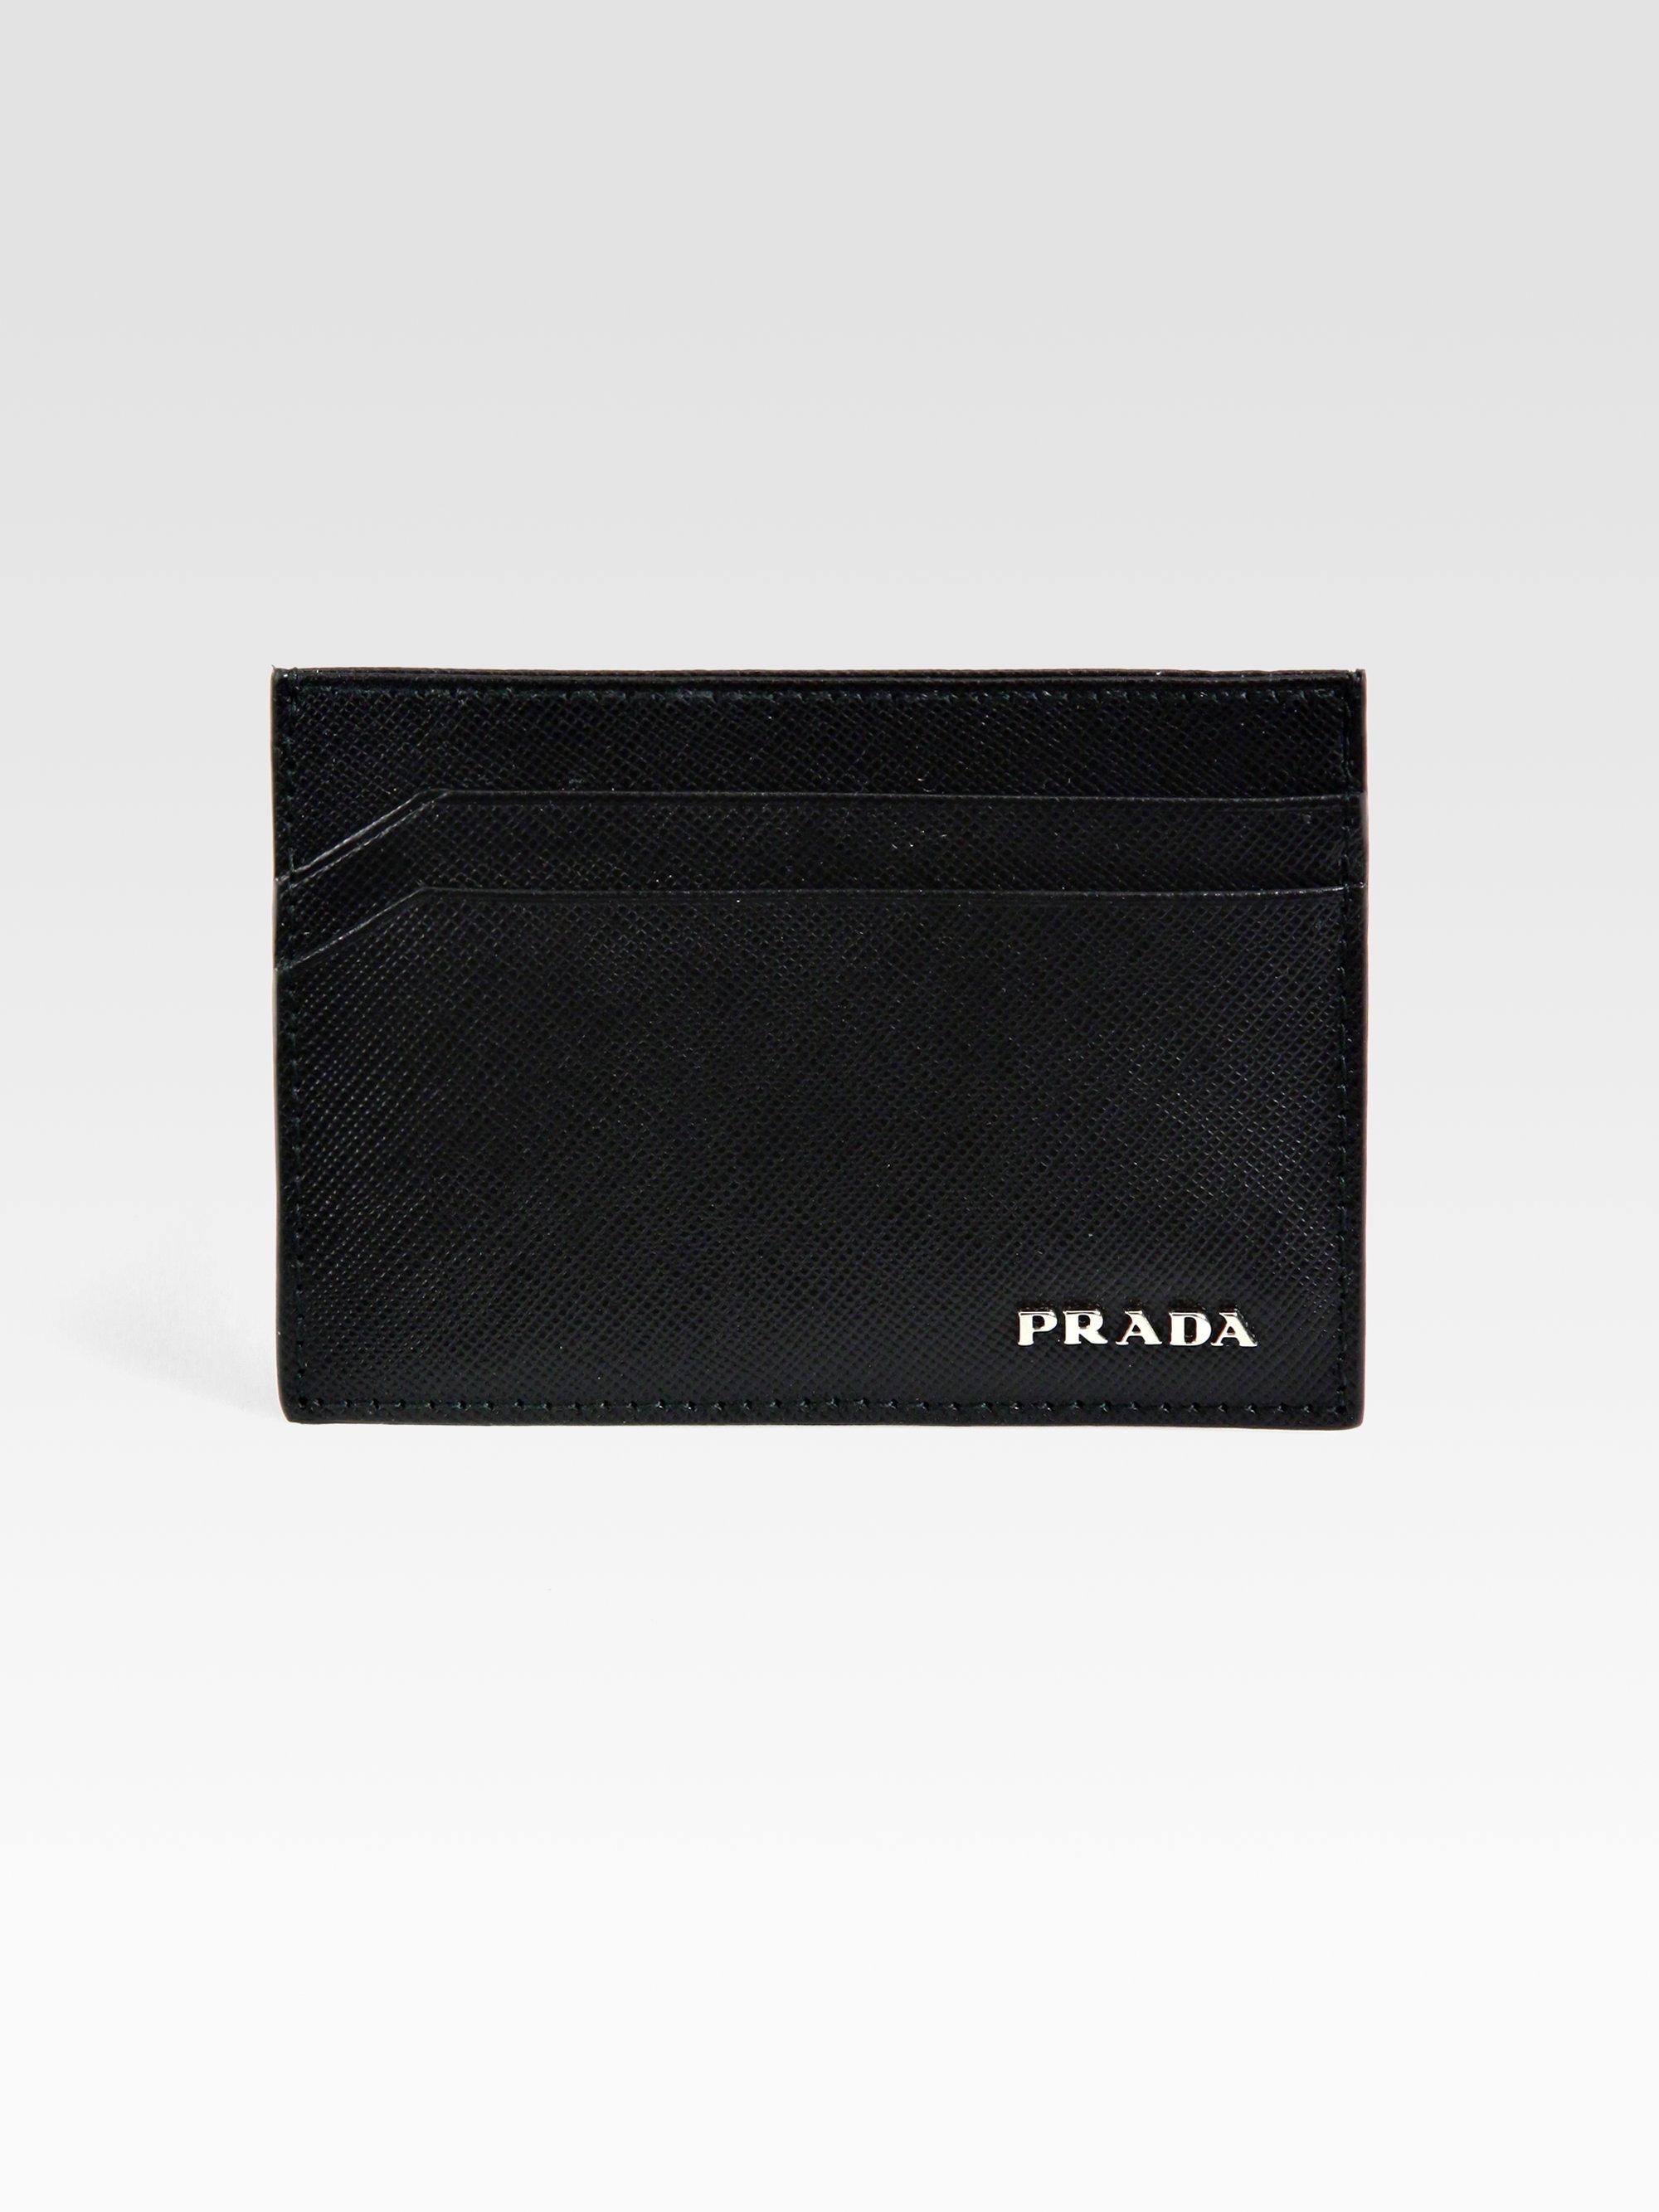 Prada Black Saffiano Leather Bifold Wallet in Black for Men | Lyst